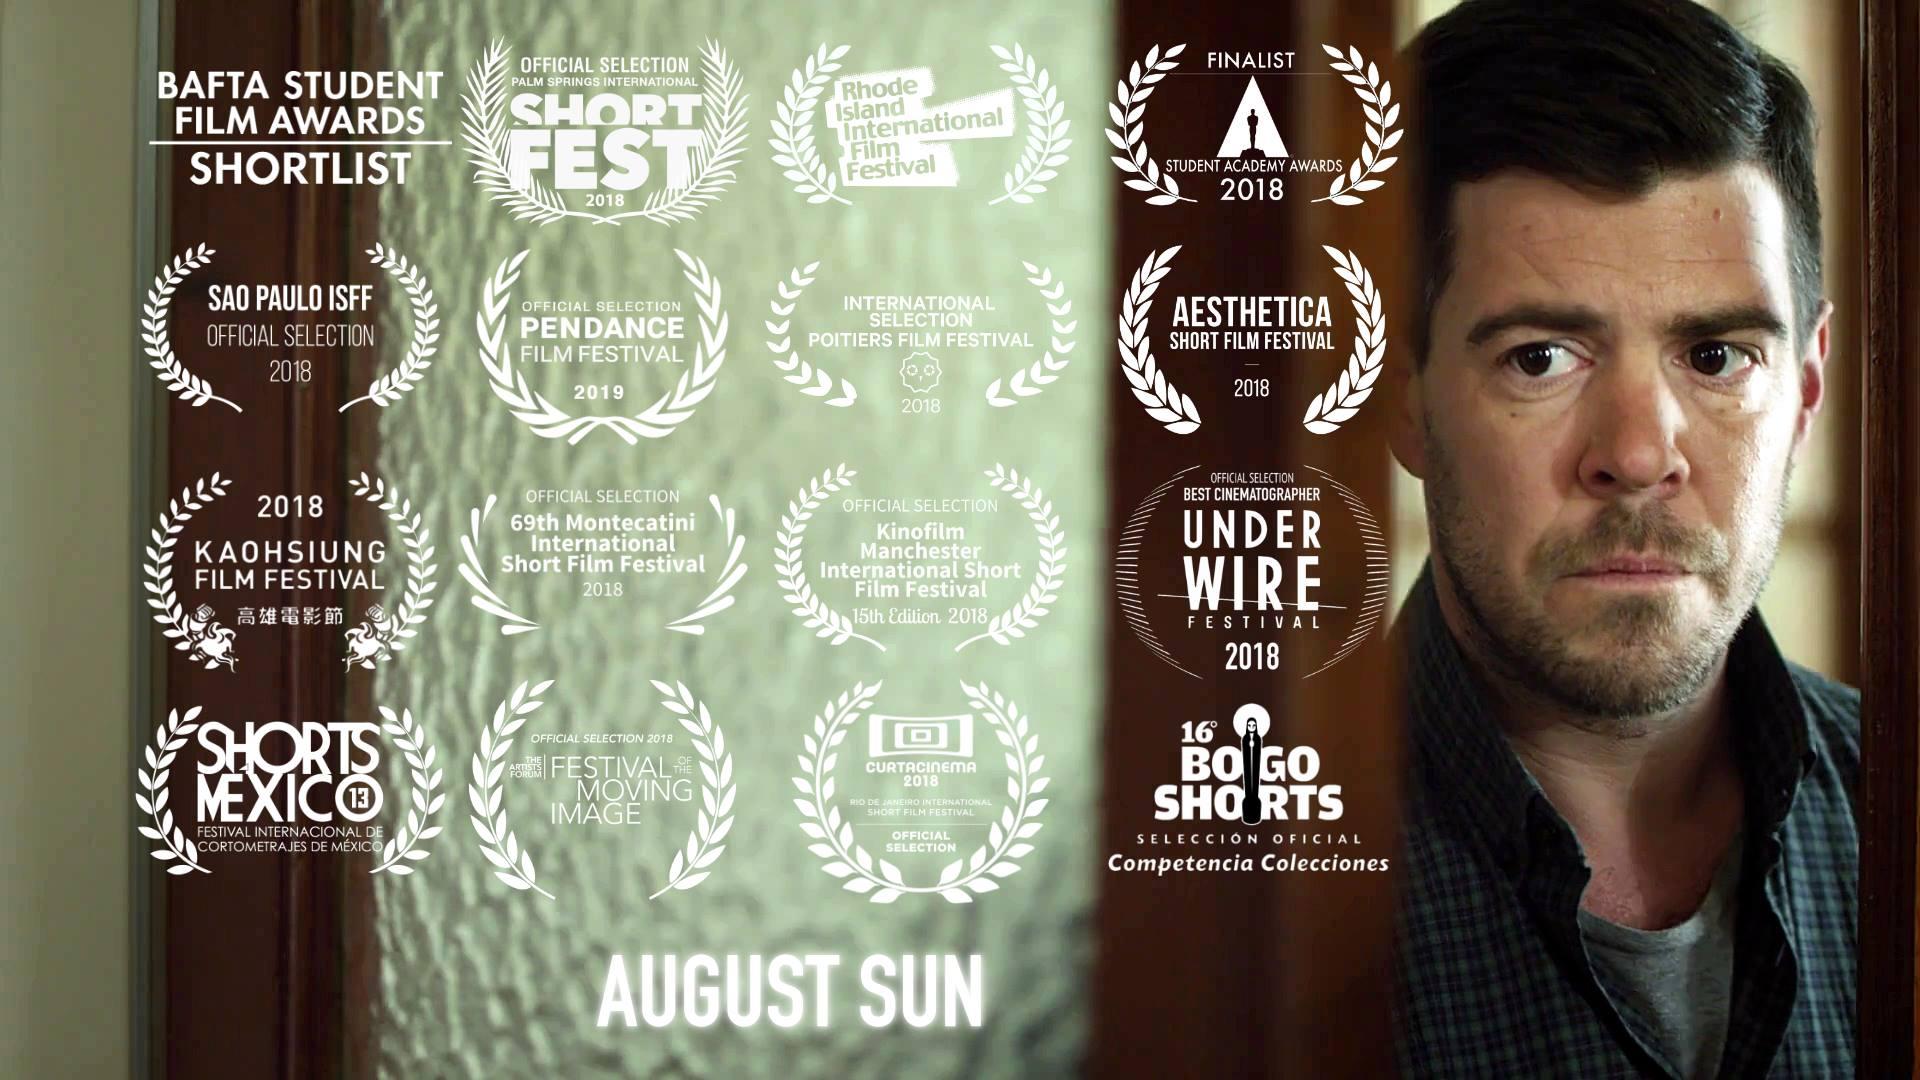 August Sun - by Franco Volpi- Finalist Student Academy Awards 2018- Shortlisted BAFTA Student Awards 2018- Aesthetica Short Film Festival 2018